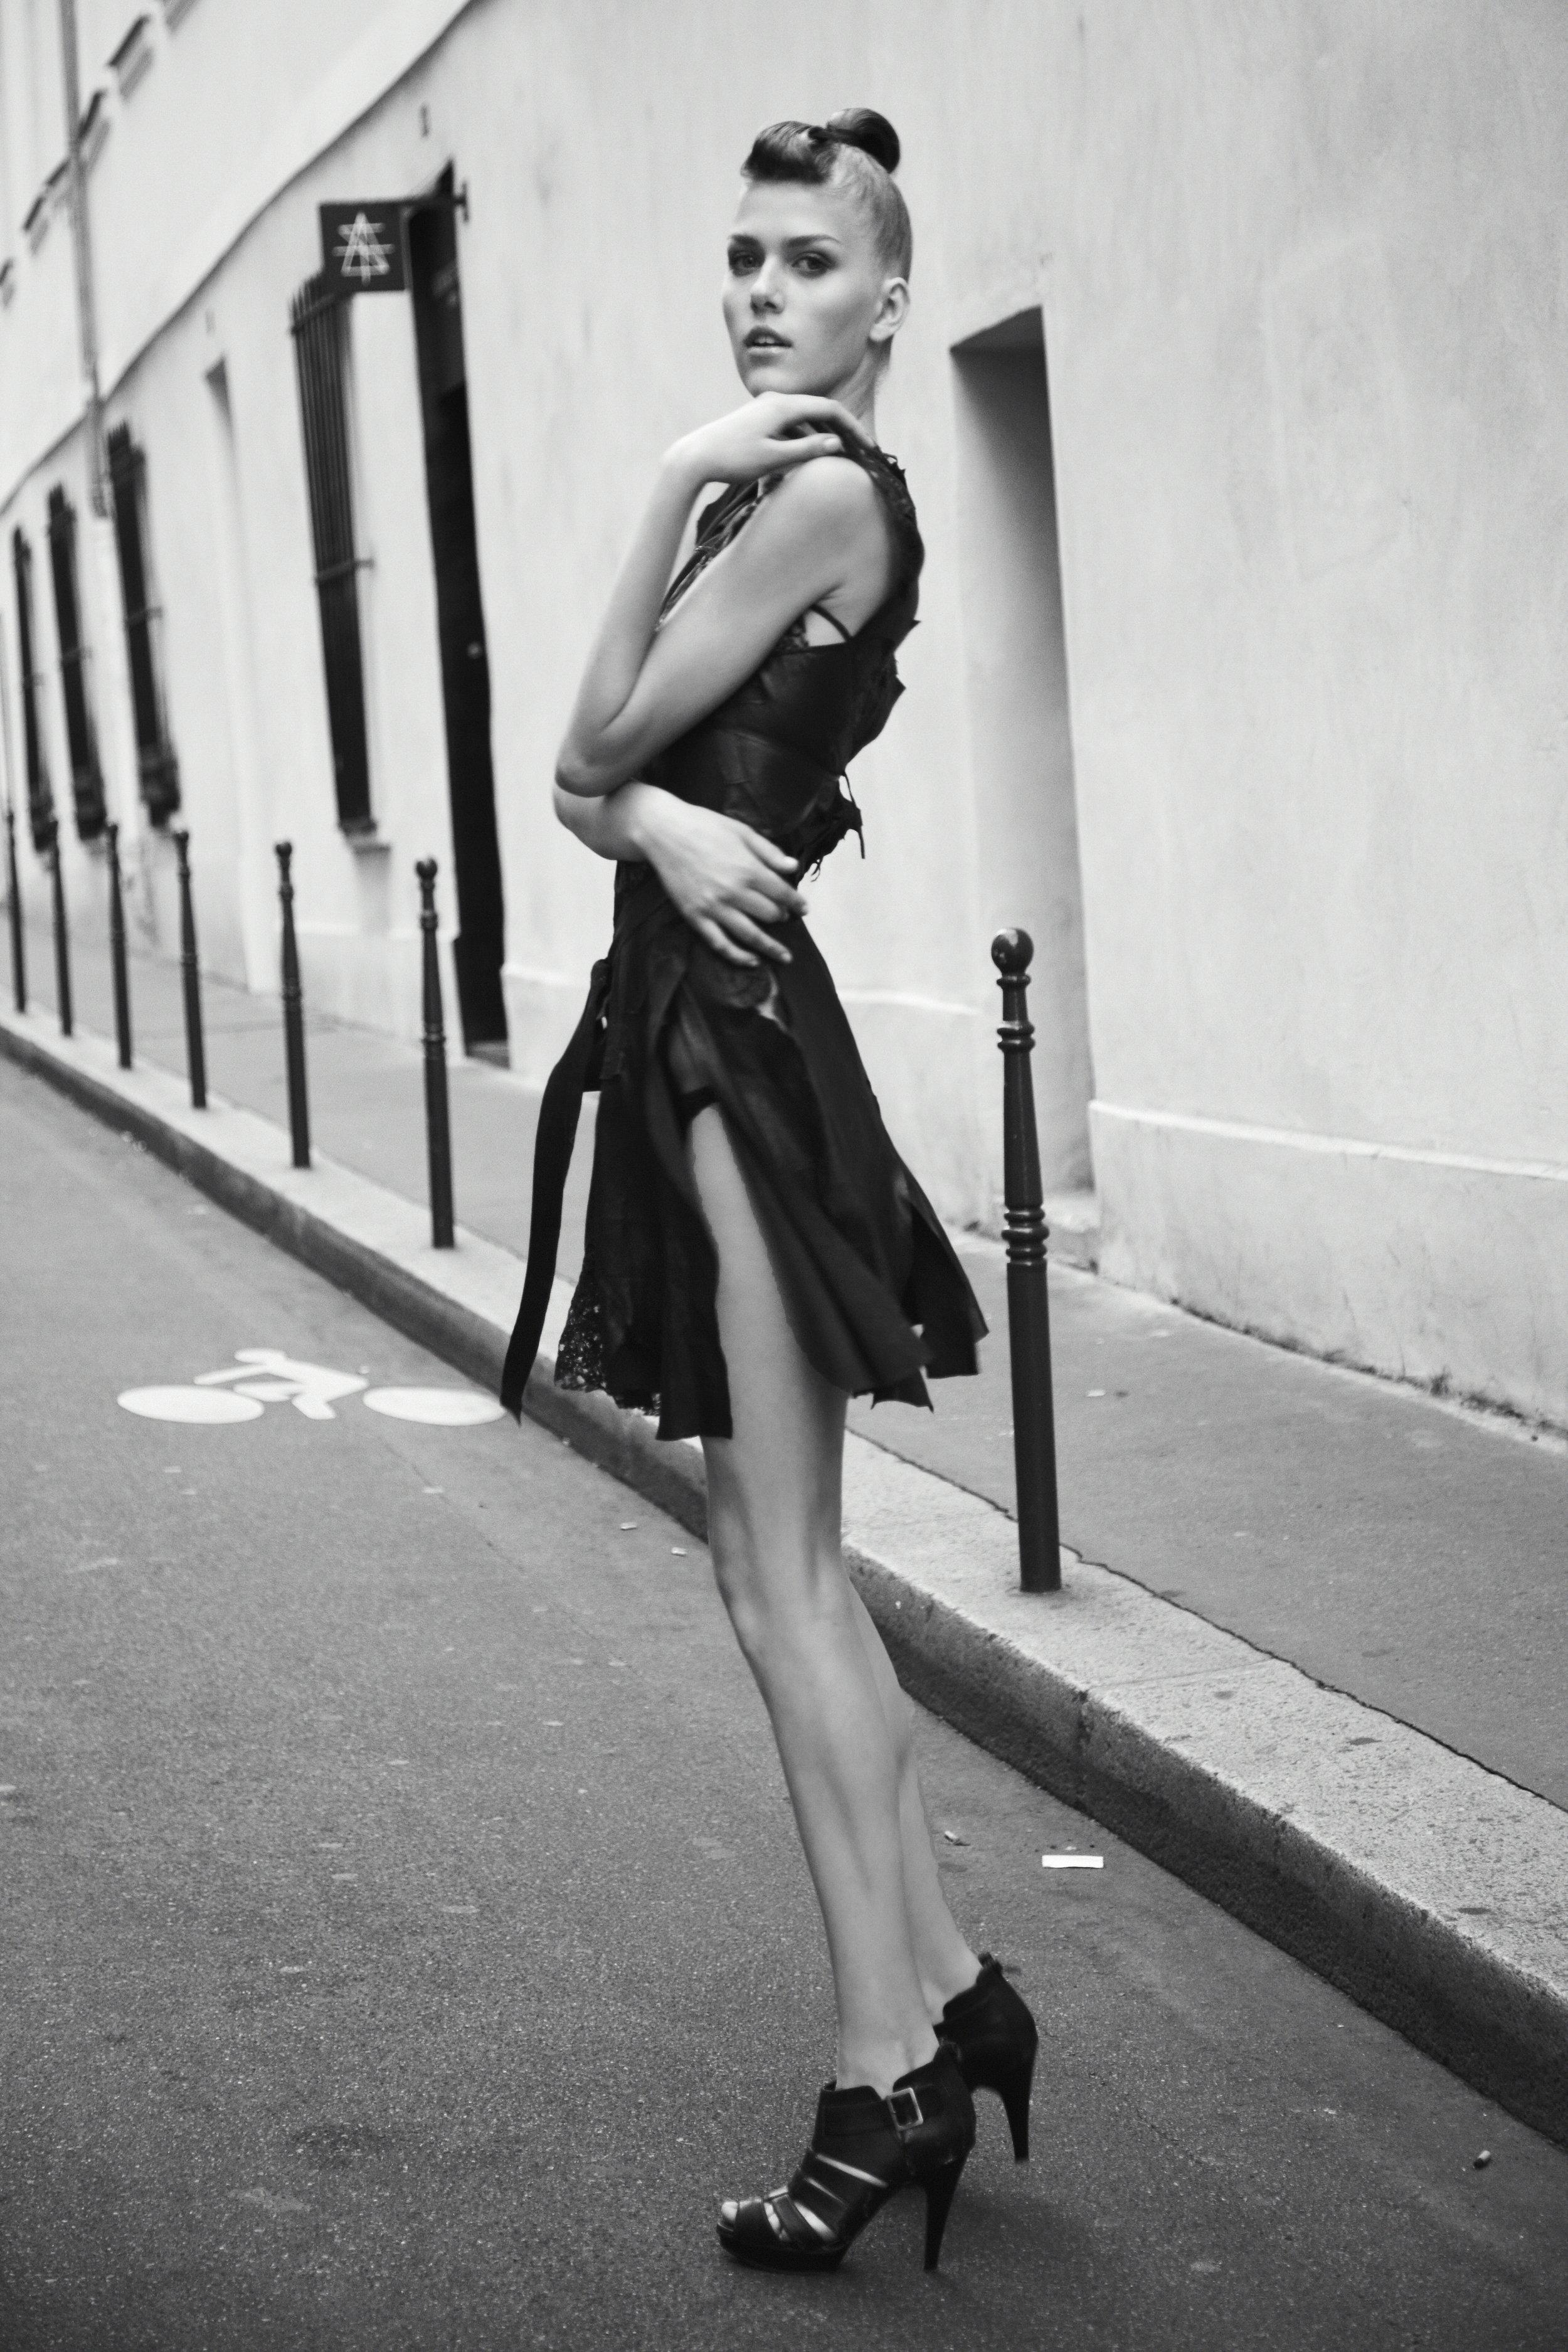 Paris_10032010-04108.jpg